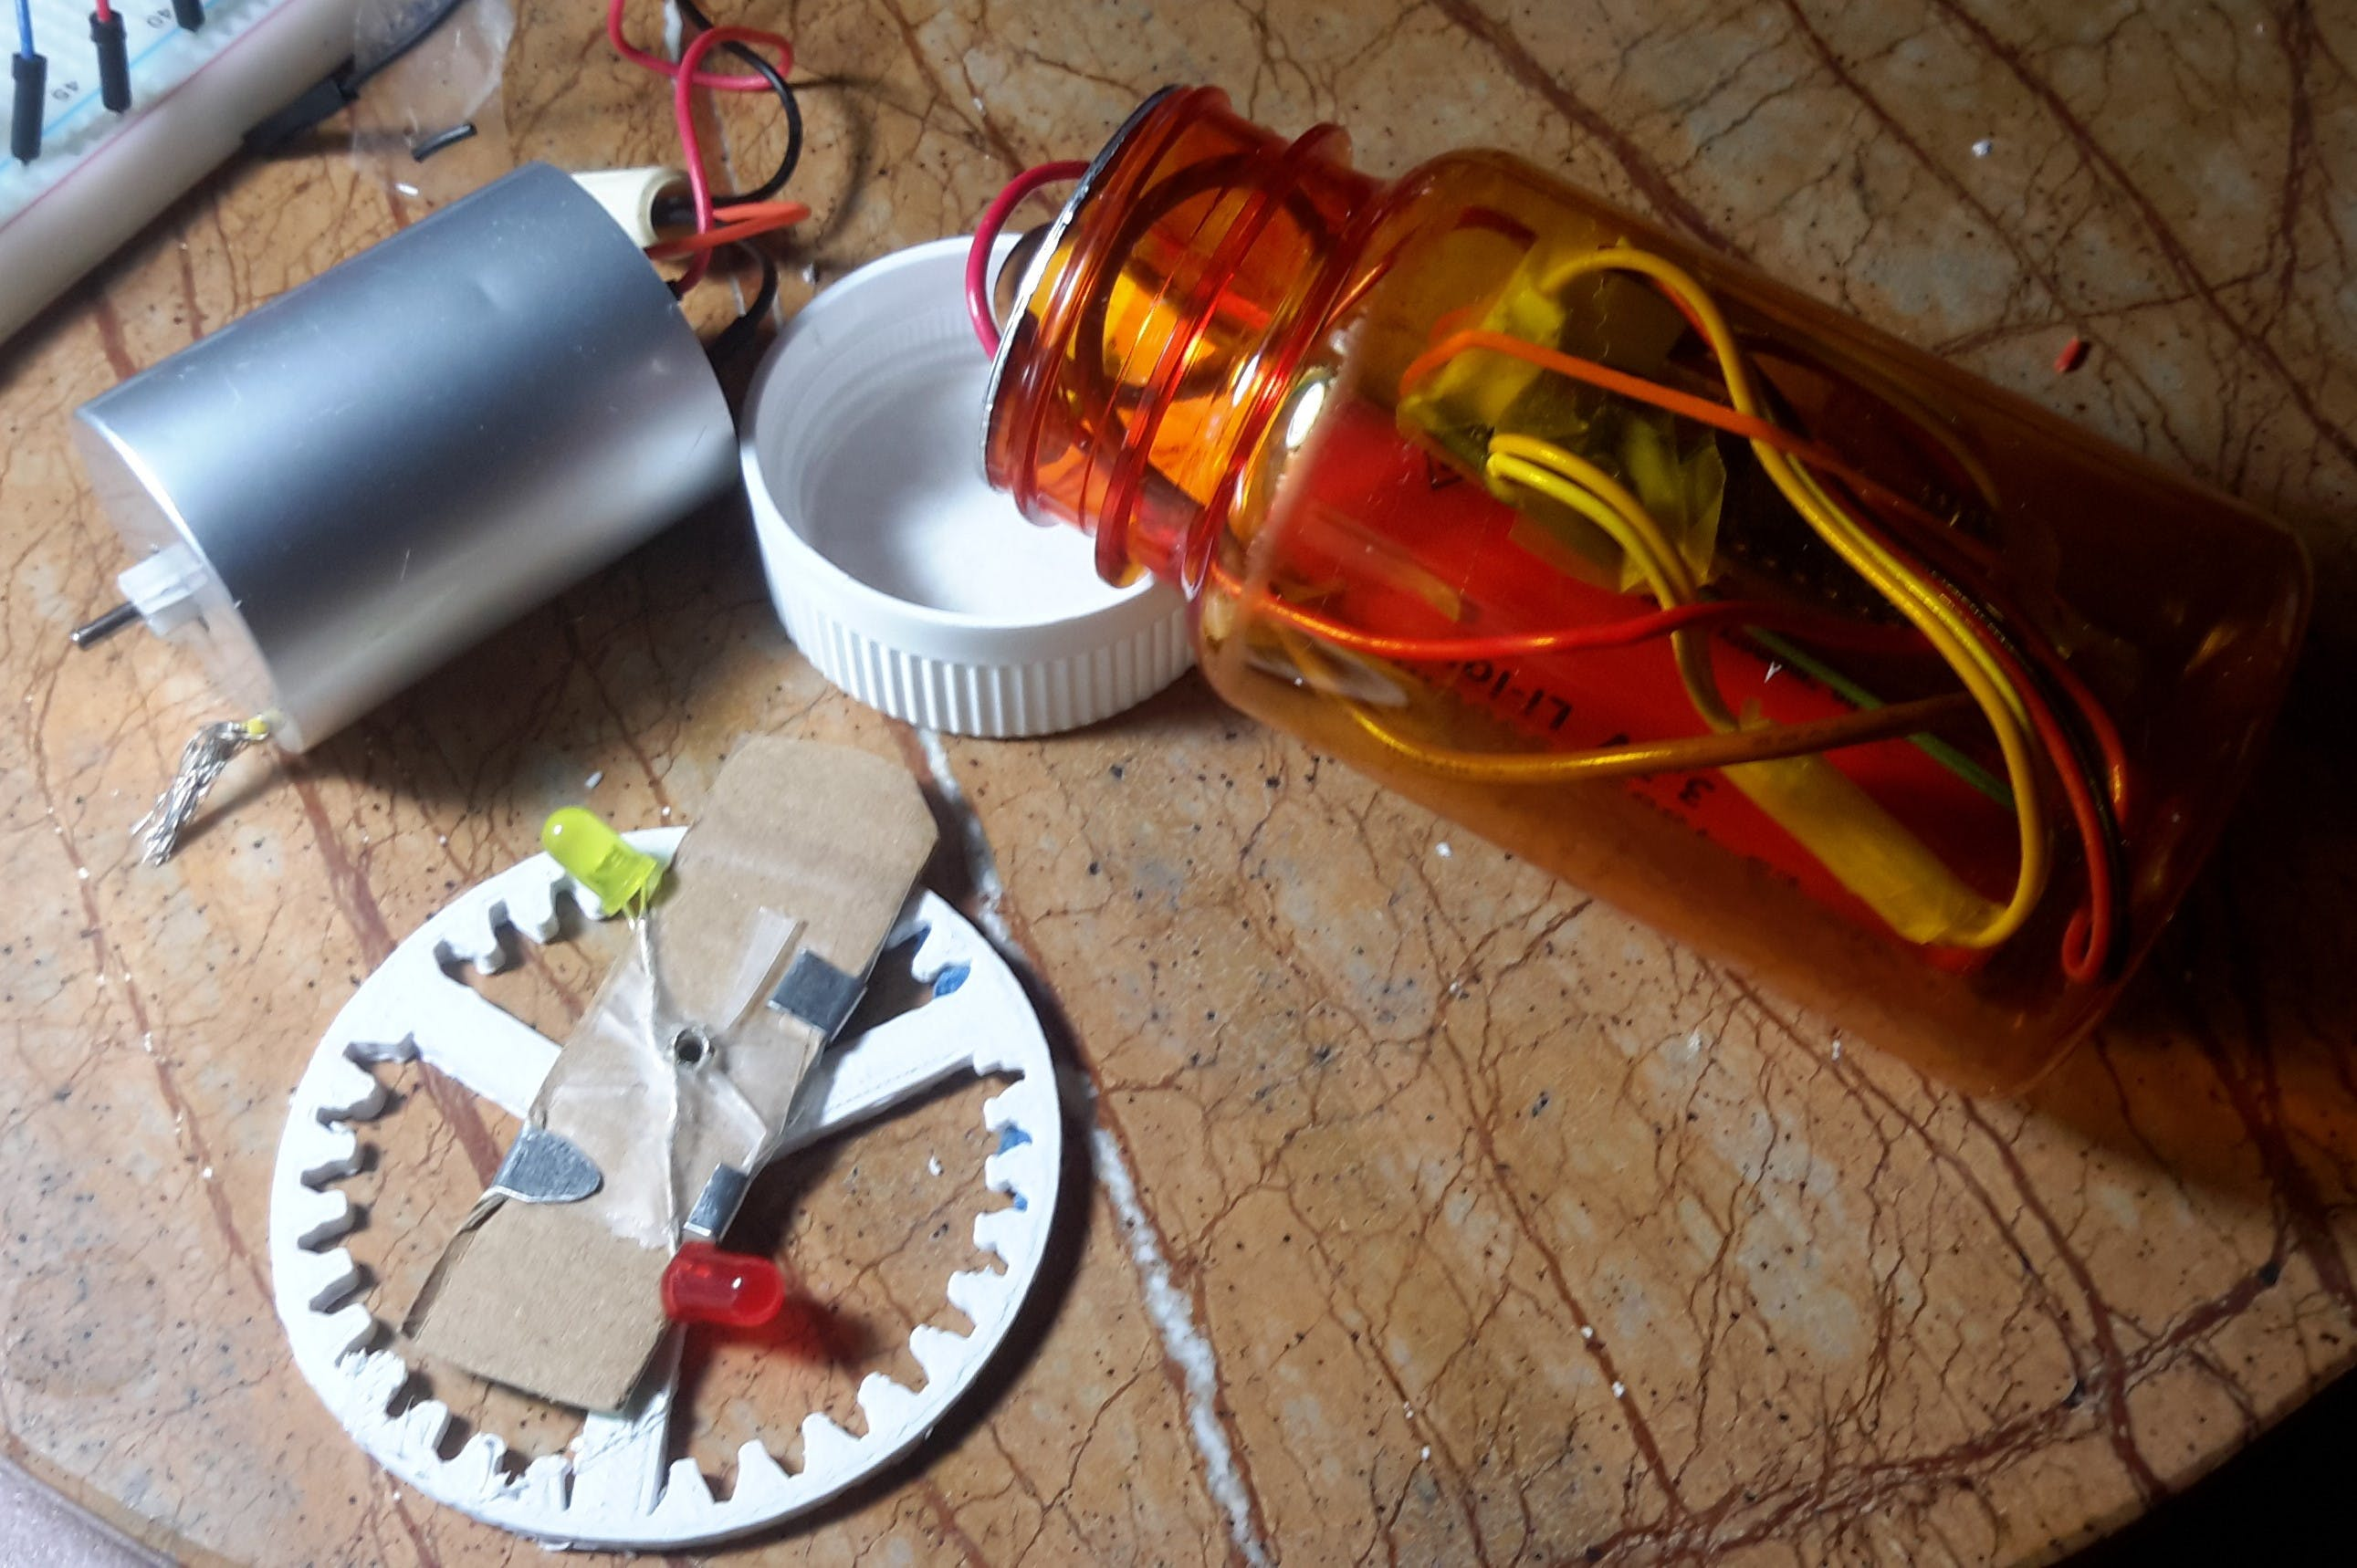 board and single 3.7v 18600 lithium easily fits inside medicine bottle.